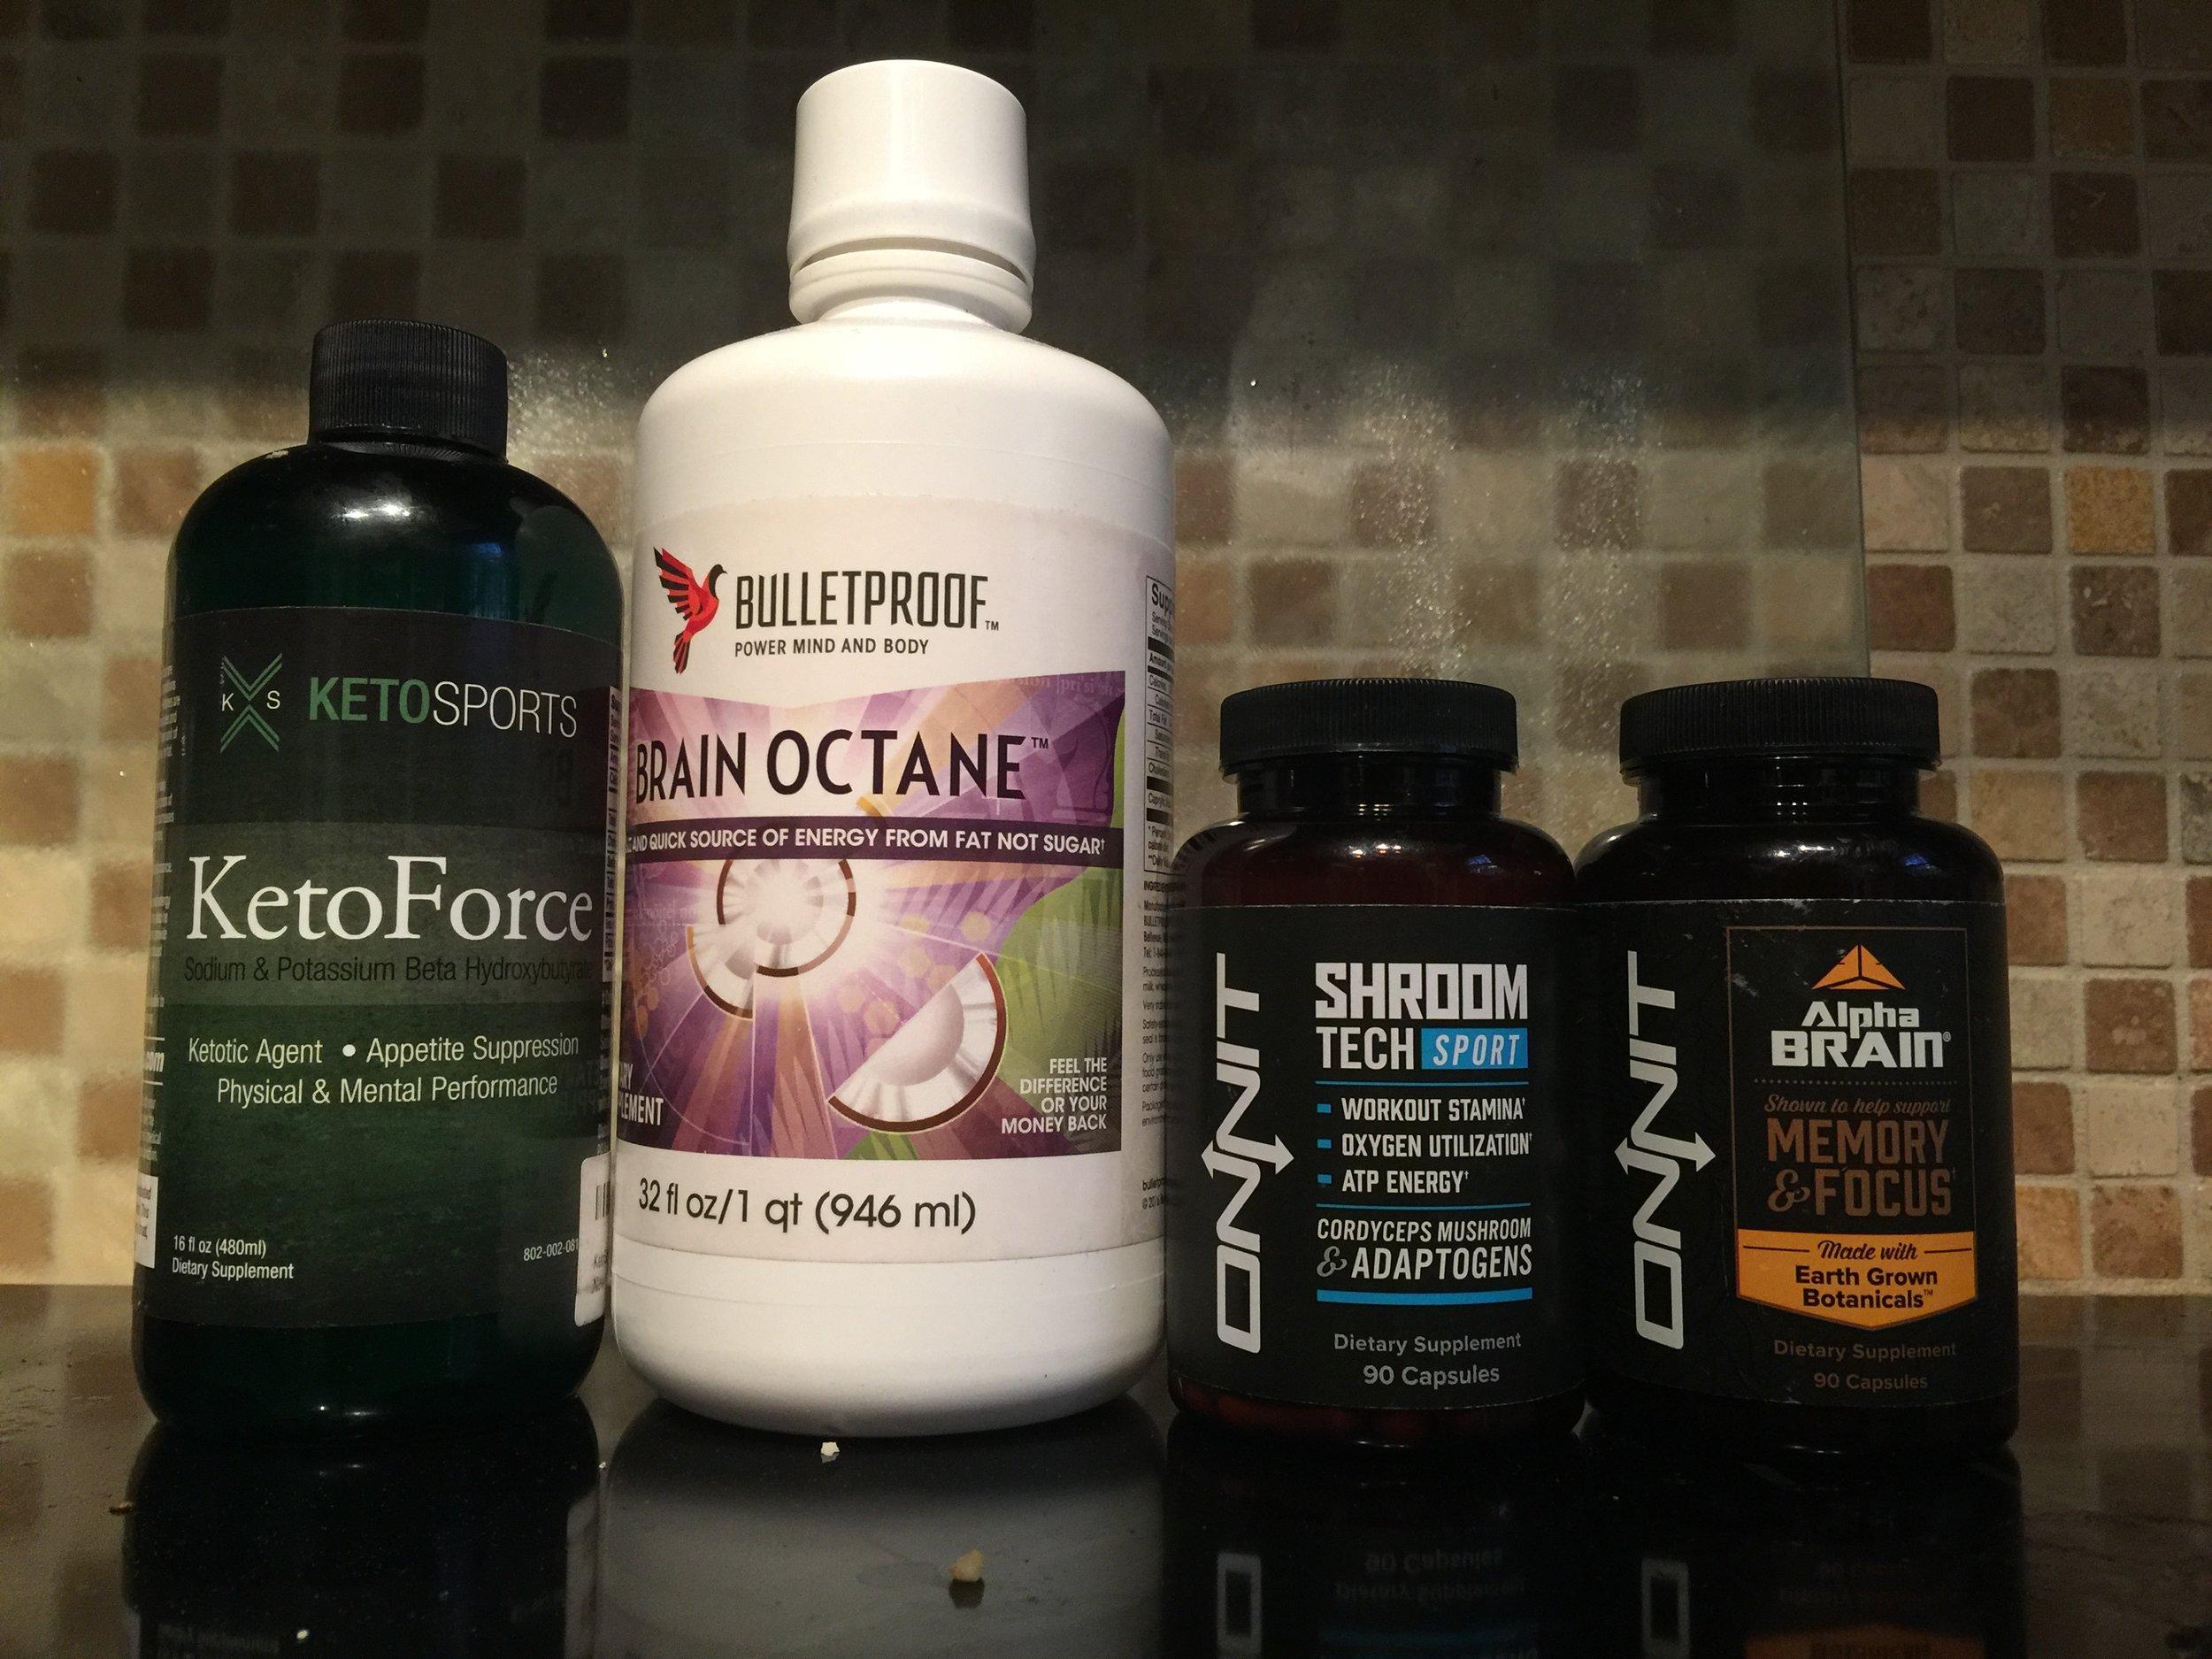 Keto Force (Beta Hydroxybutyrate), Brain Octane MCT oil, Shroom Tech Sport, Alpha Brain